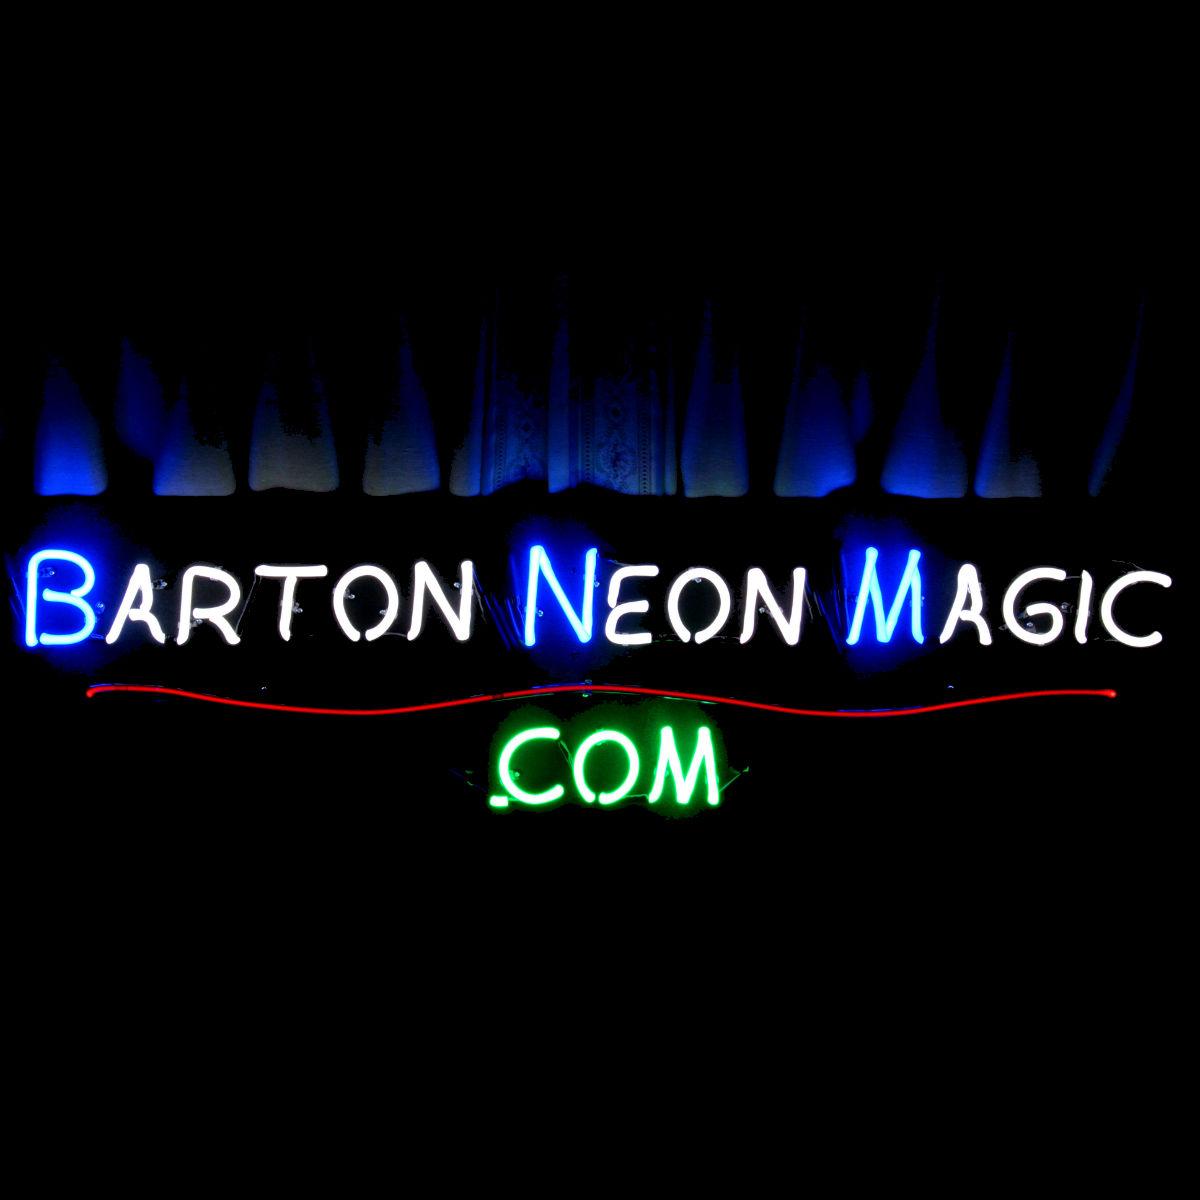 Custom Exotic Car Neon Sculptures by John Barton - BartonNeonMagic.com